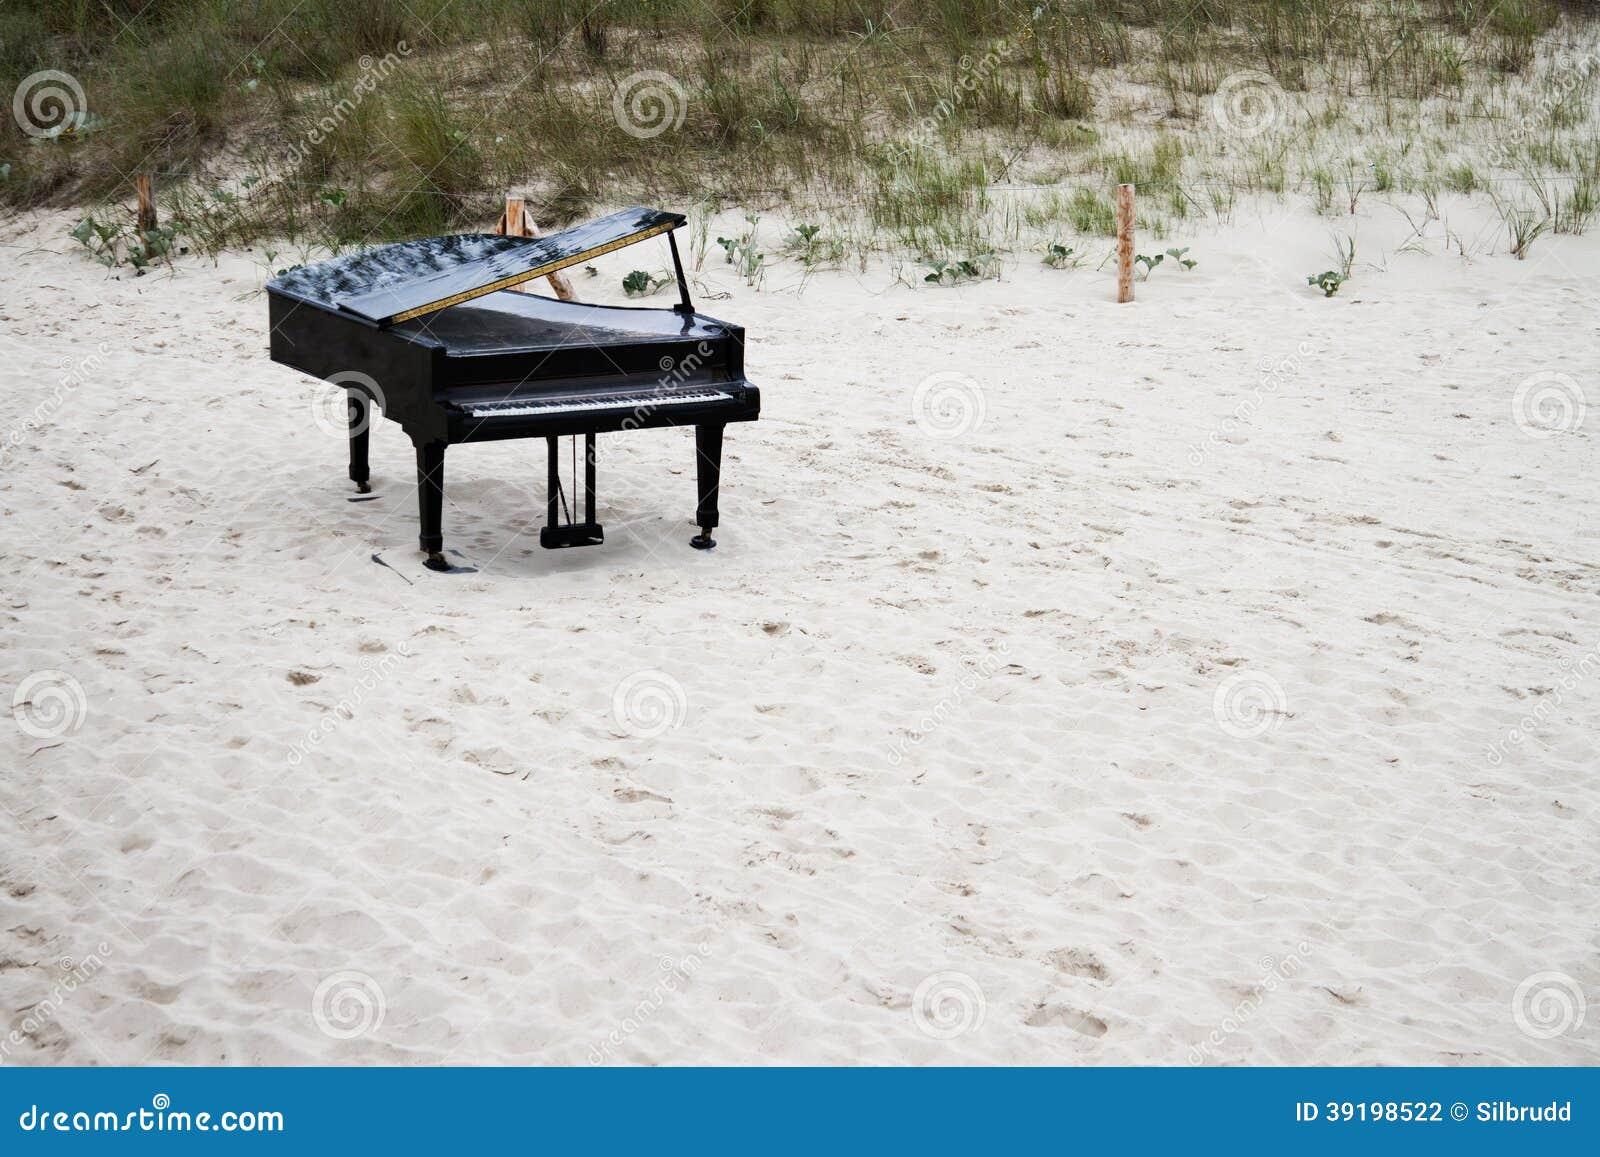 Grand Piano On The Beach Stock Photo - Image: 39198522